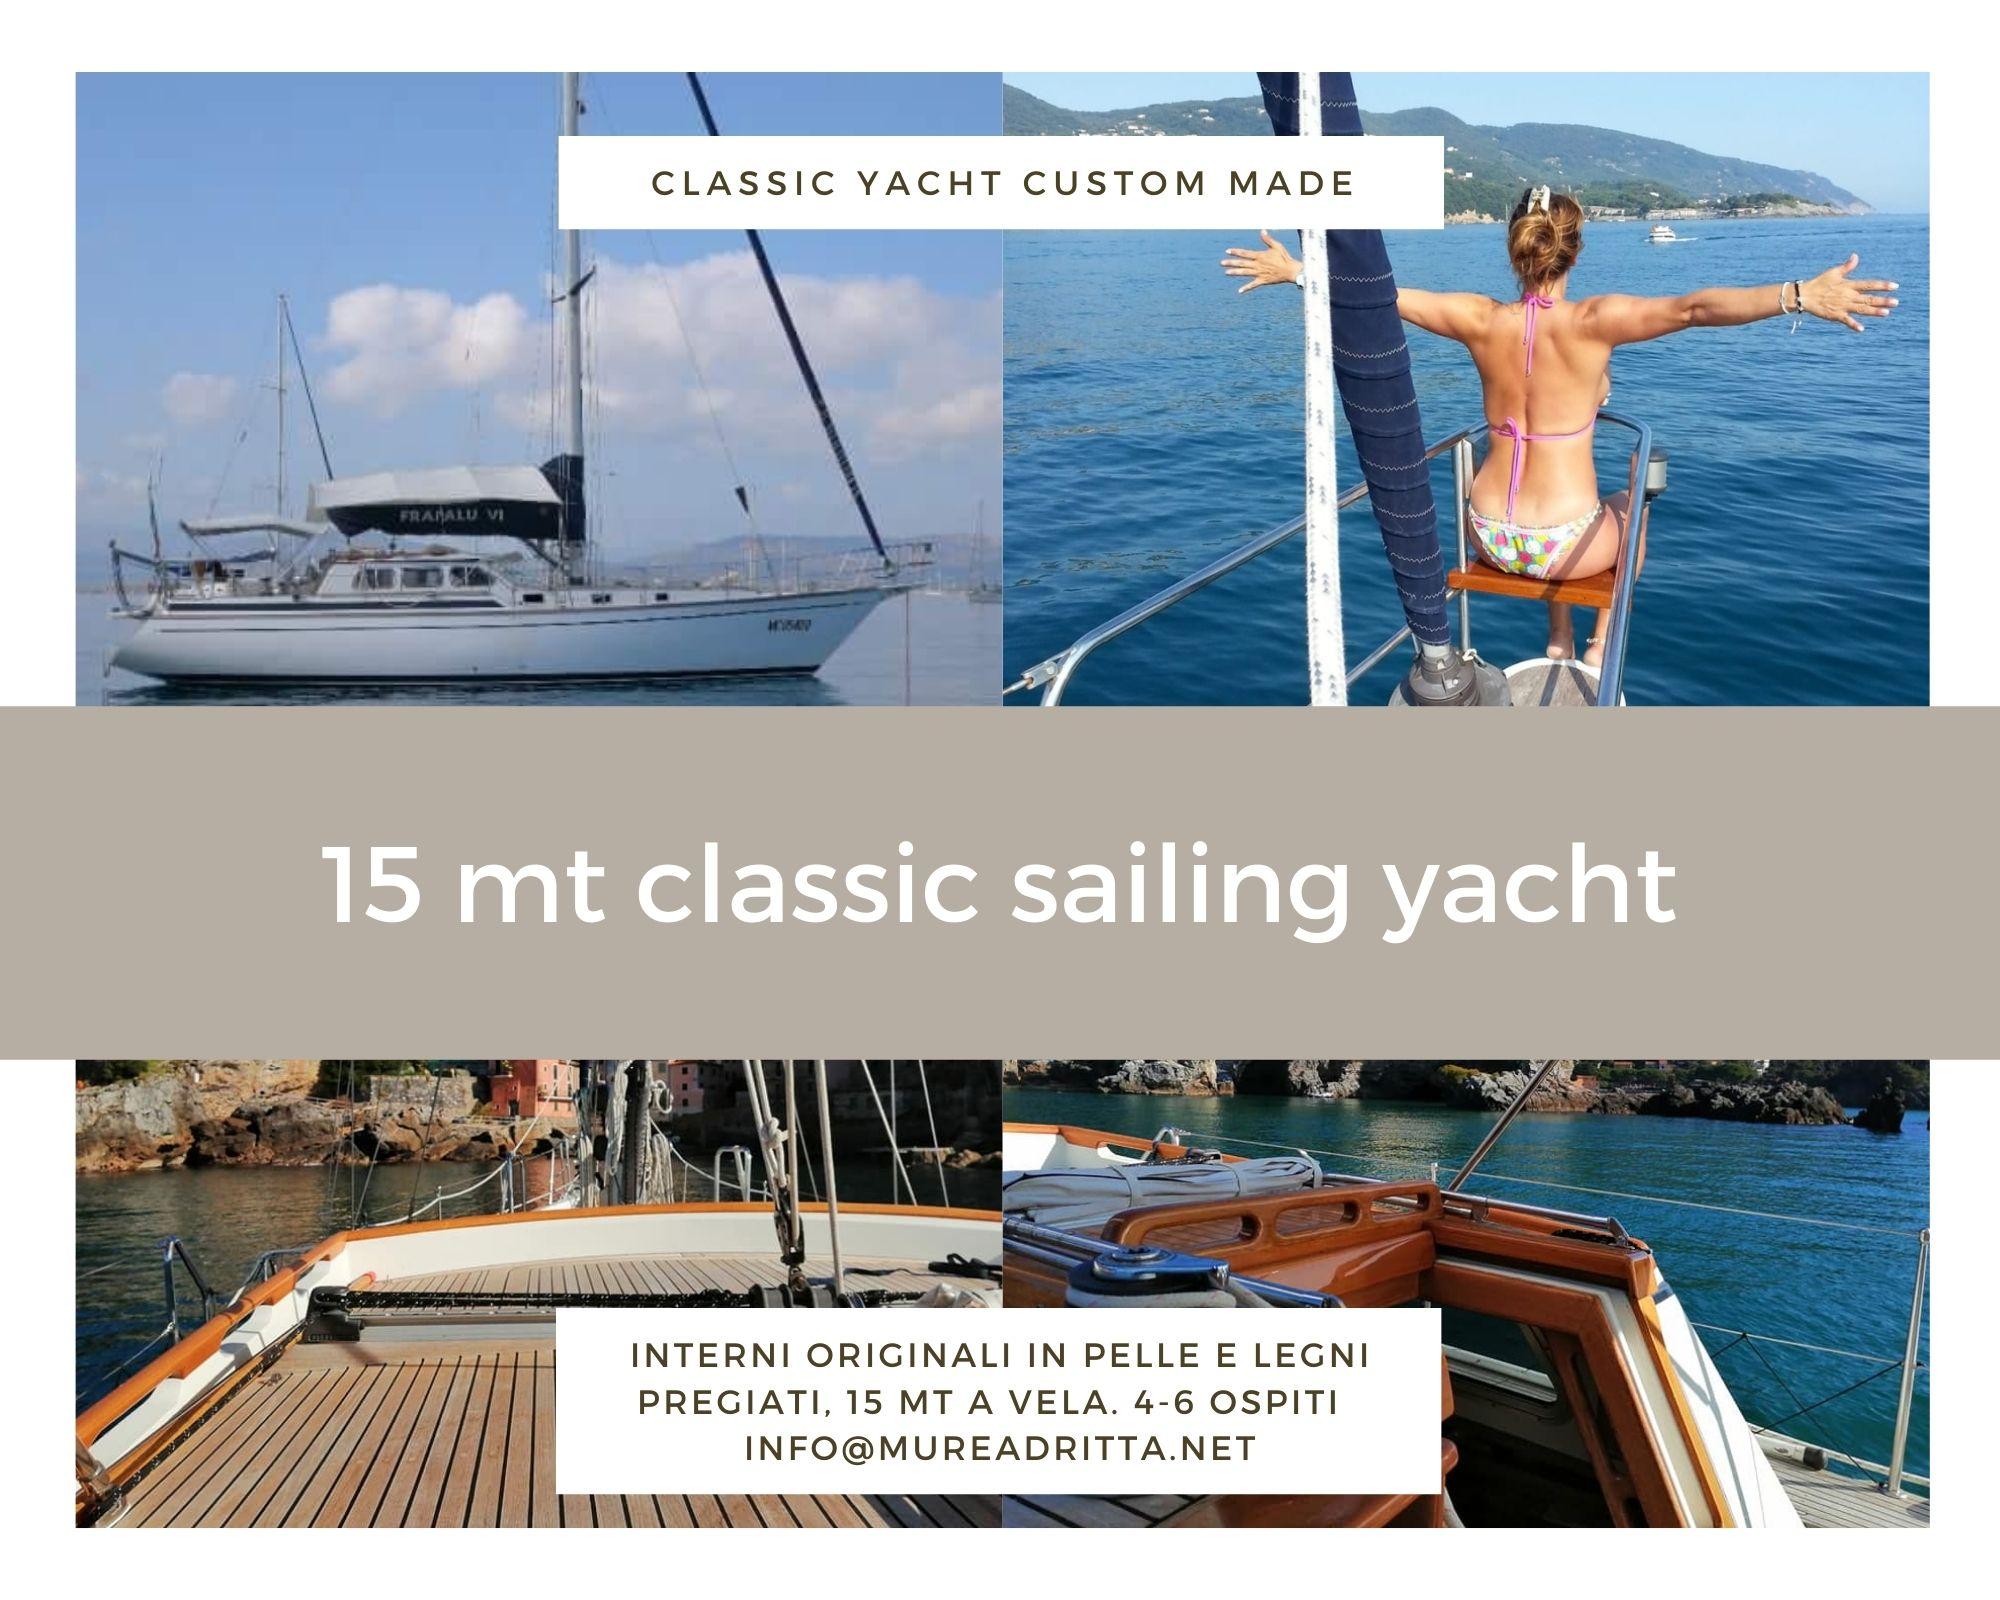 MAD Yachts